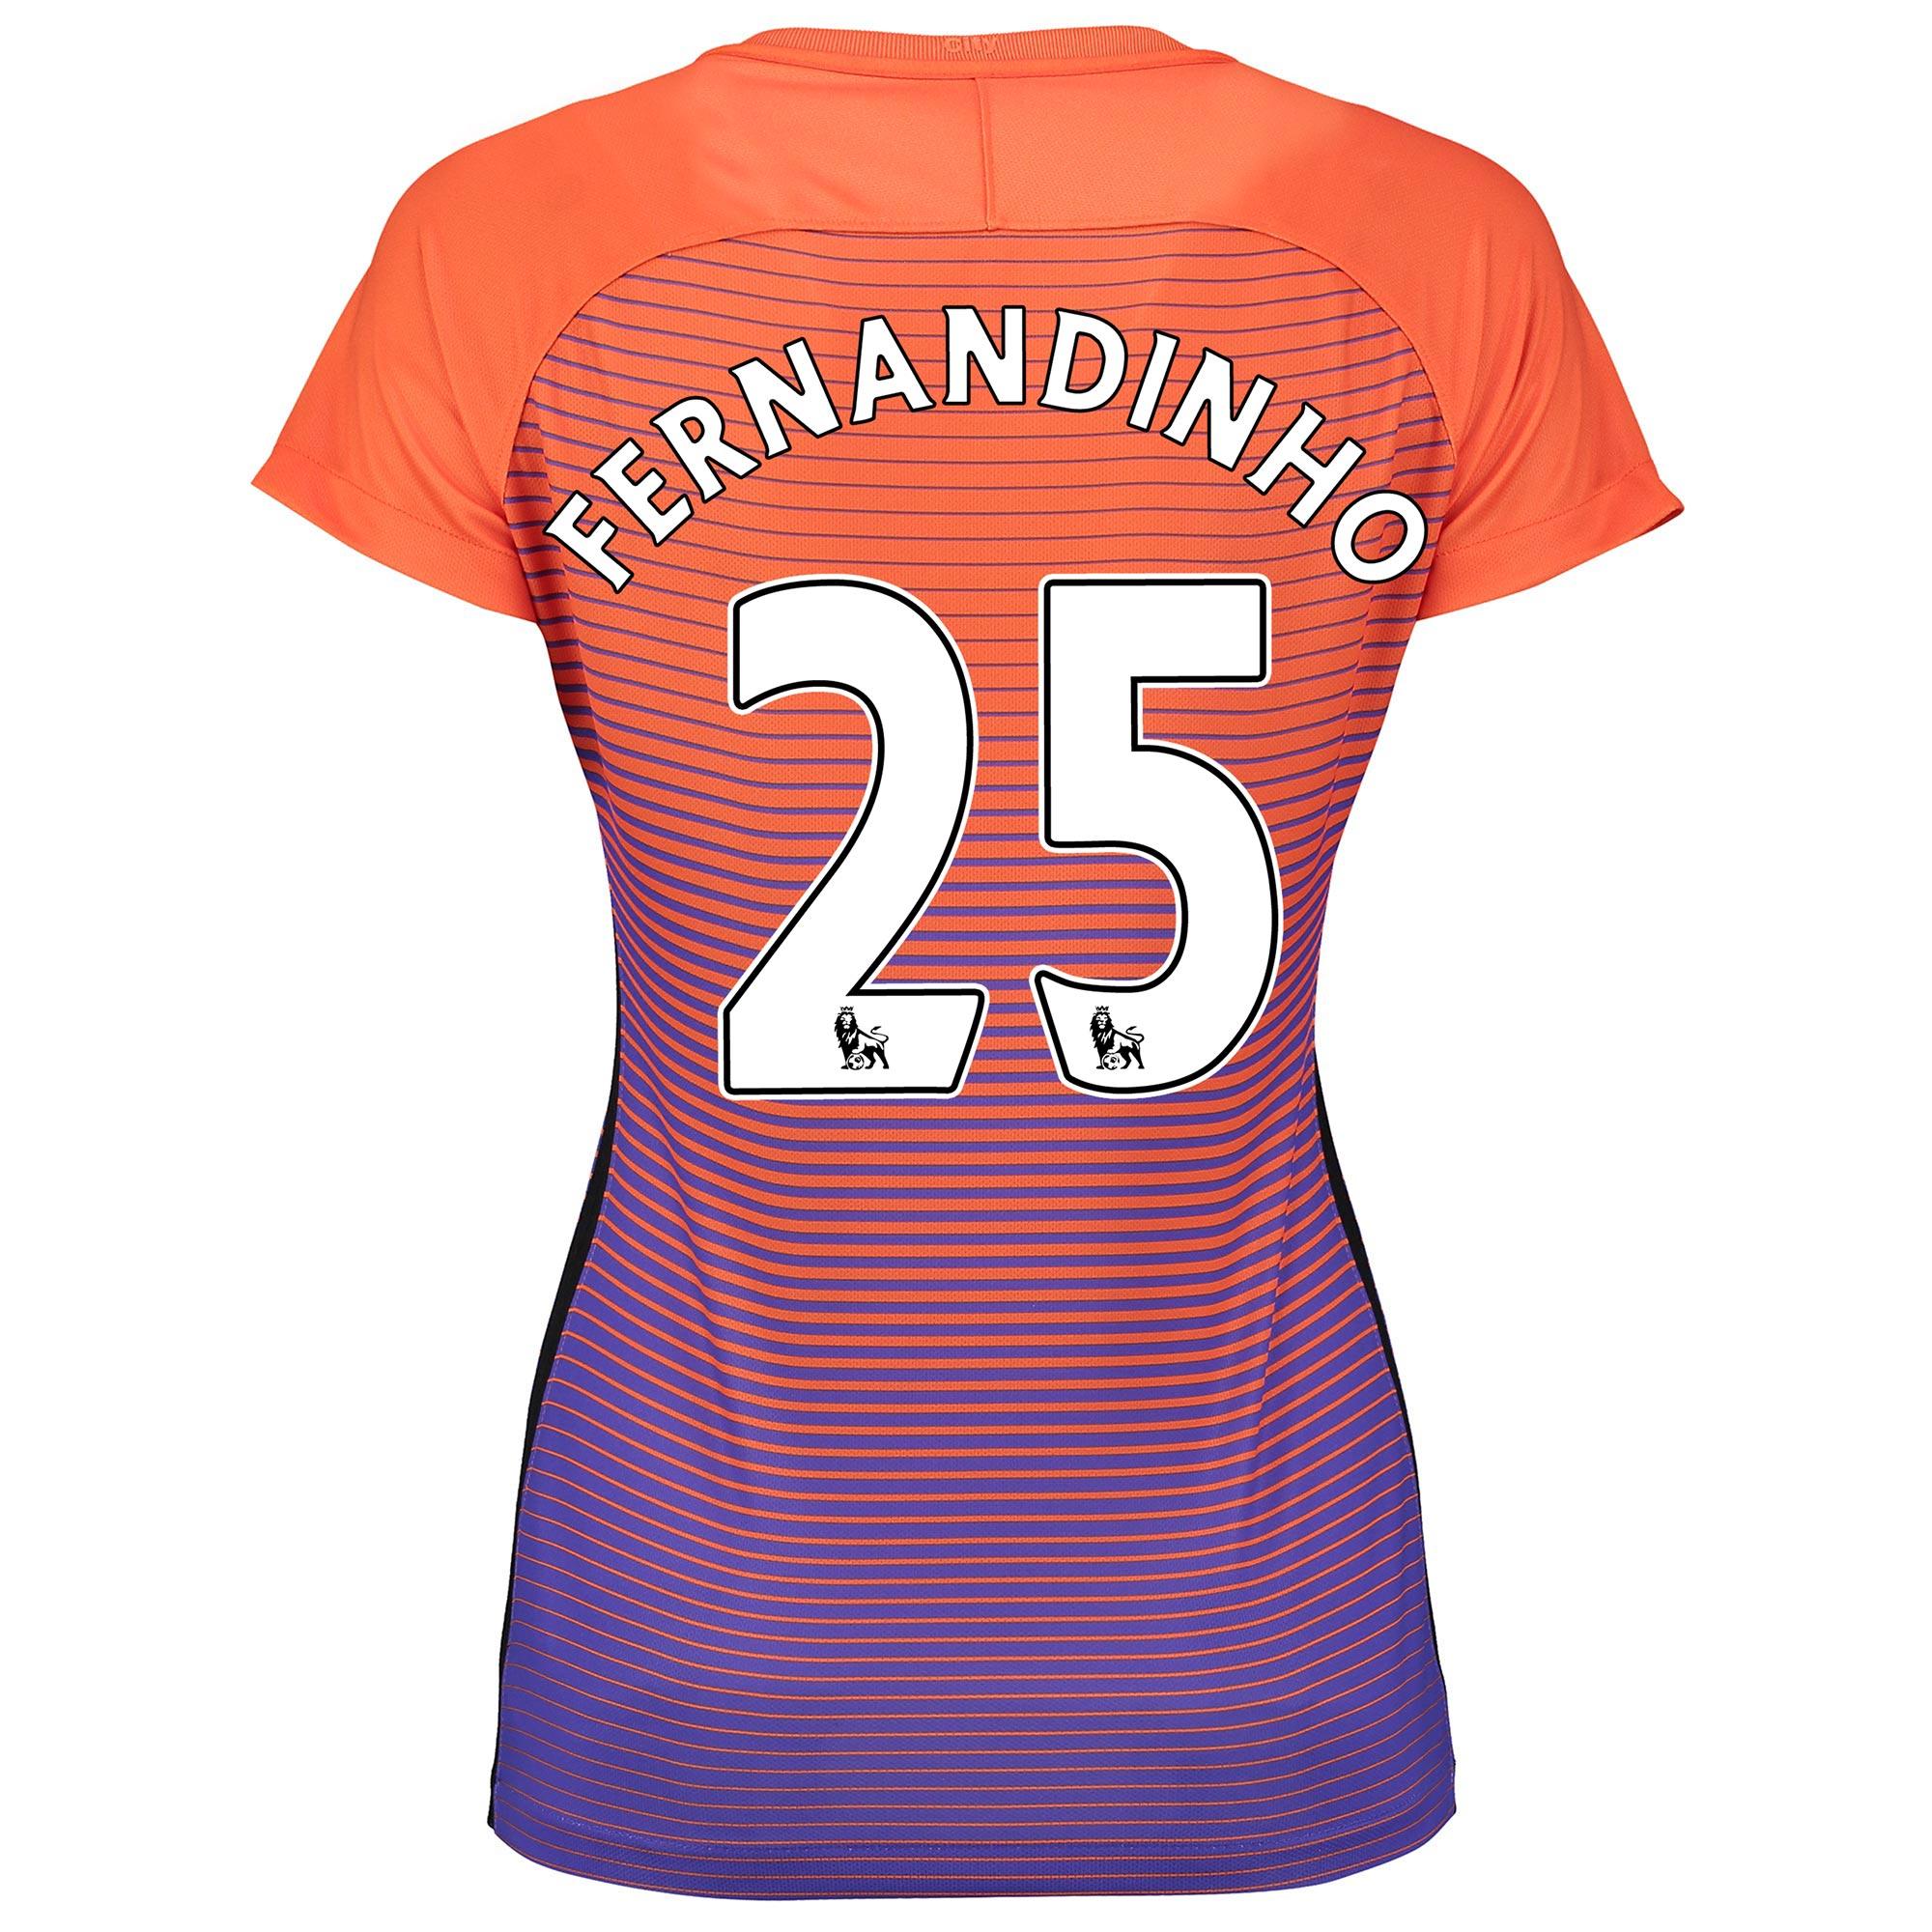 Manchester City Third Stadium Shirt 2016-17 - Womens with Fernandinho